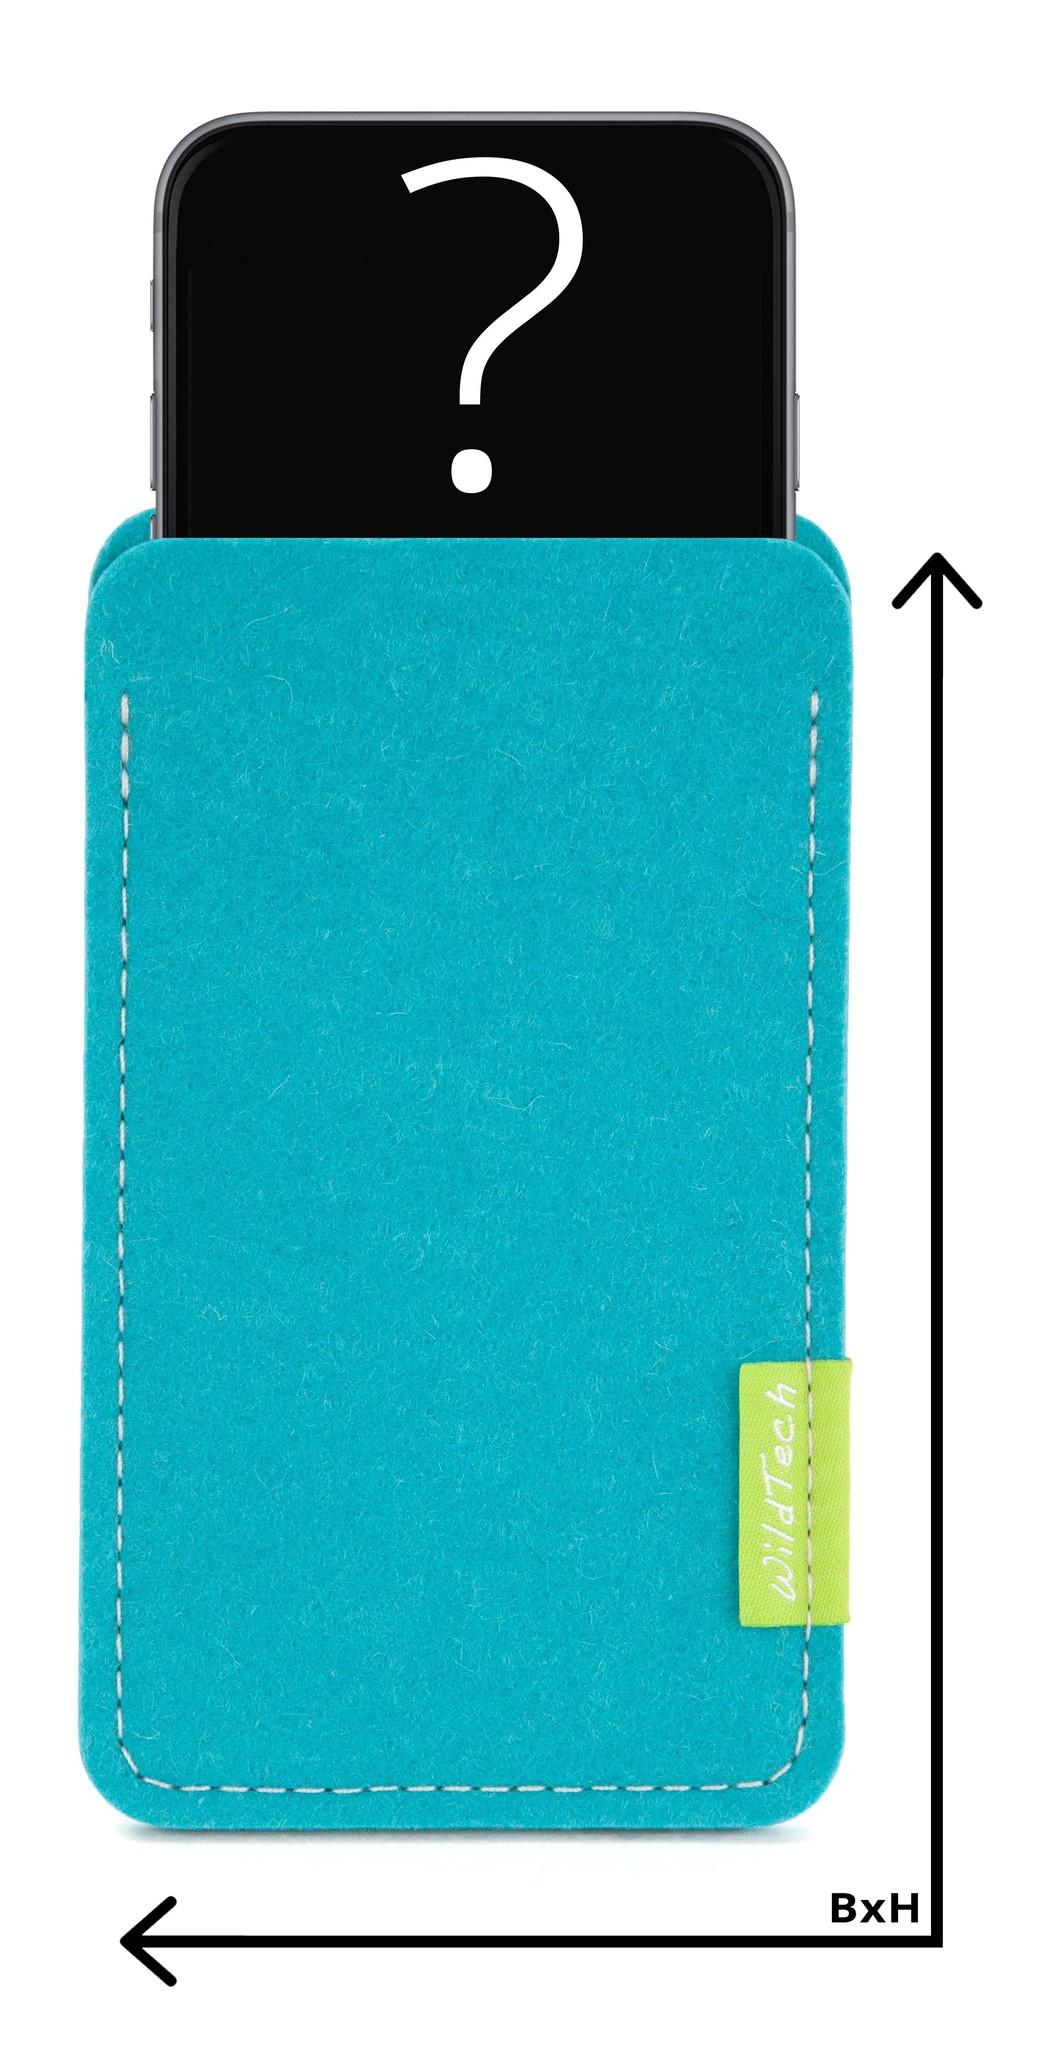 Individuelles Smartphone Sleeve Türkis-1